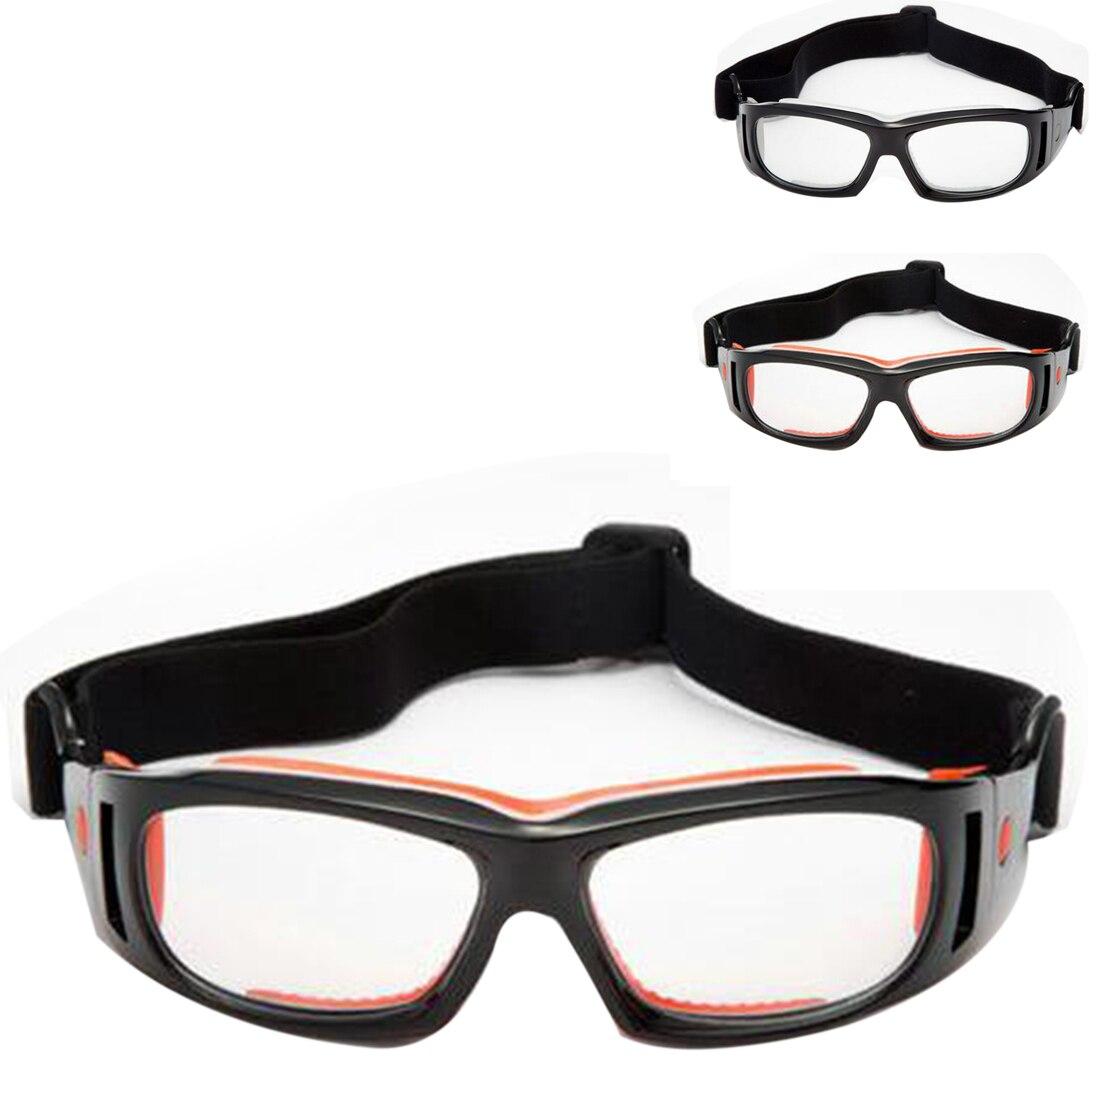 Sports frames for eyeglasses - Sports Eye Safety Protection Glasses Basketball Soccer Optical Eyeglasses Eye Glasses Spectacle Frame Eyewear Myopia